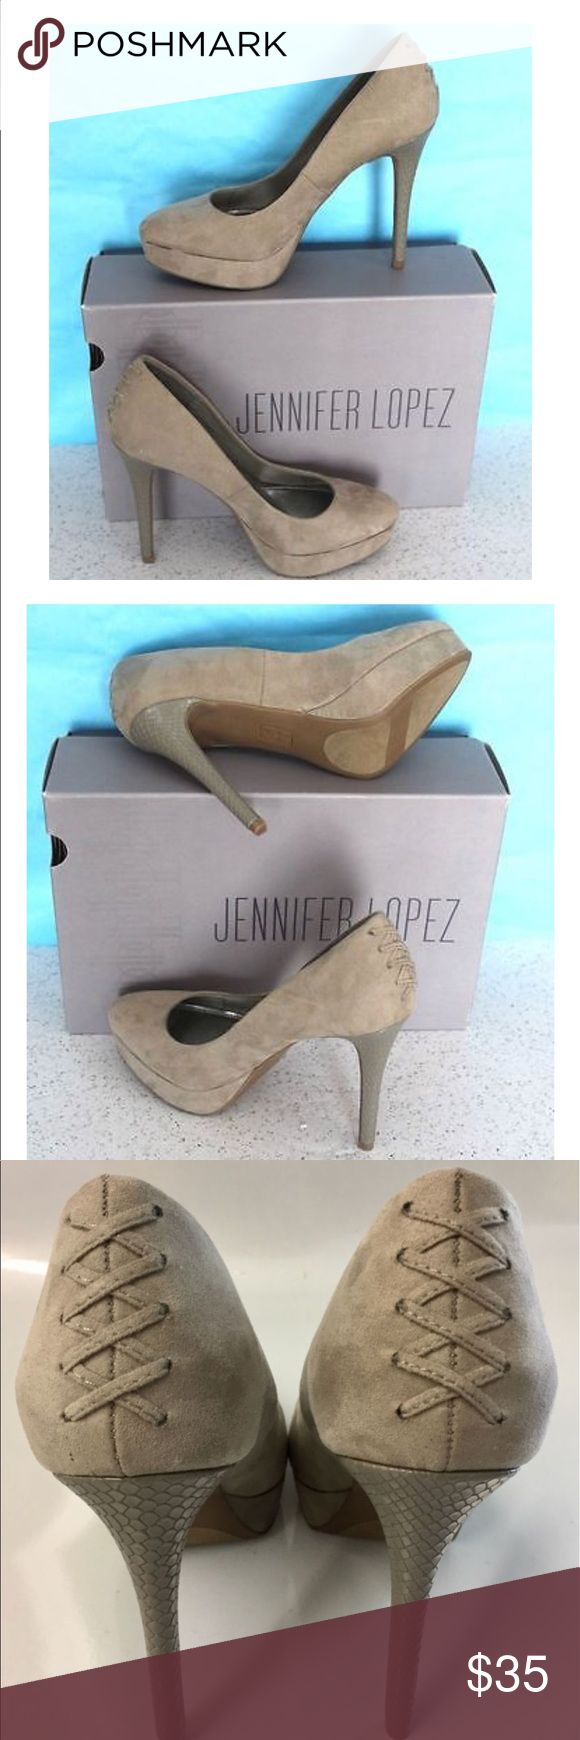 NWT Jennifer Lopez JLo Lucille High Heels Size 10 NWT Women's Jennifer Lopez JLo Lucille Grey High Heel Shoes Size 10 Jennifer Lopez Shoes Heels